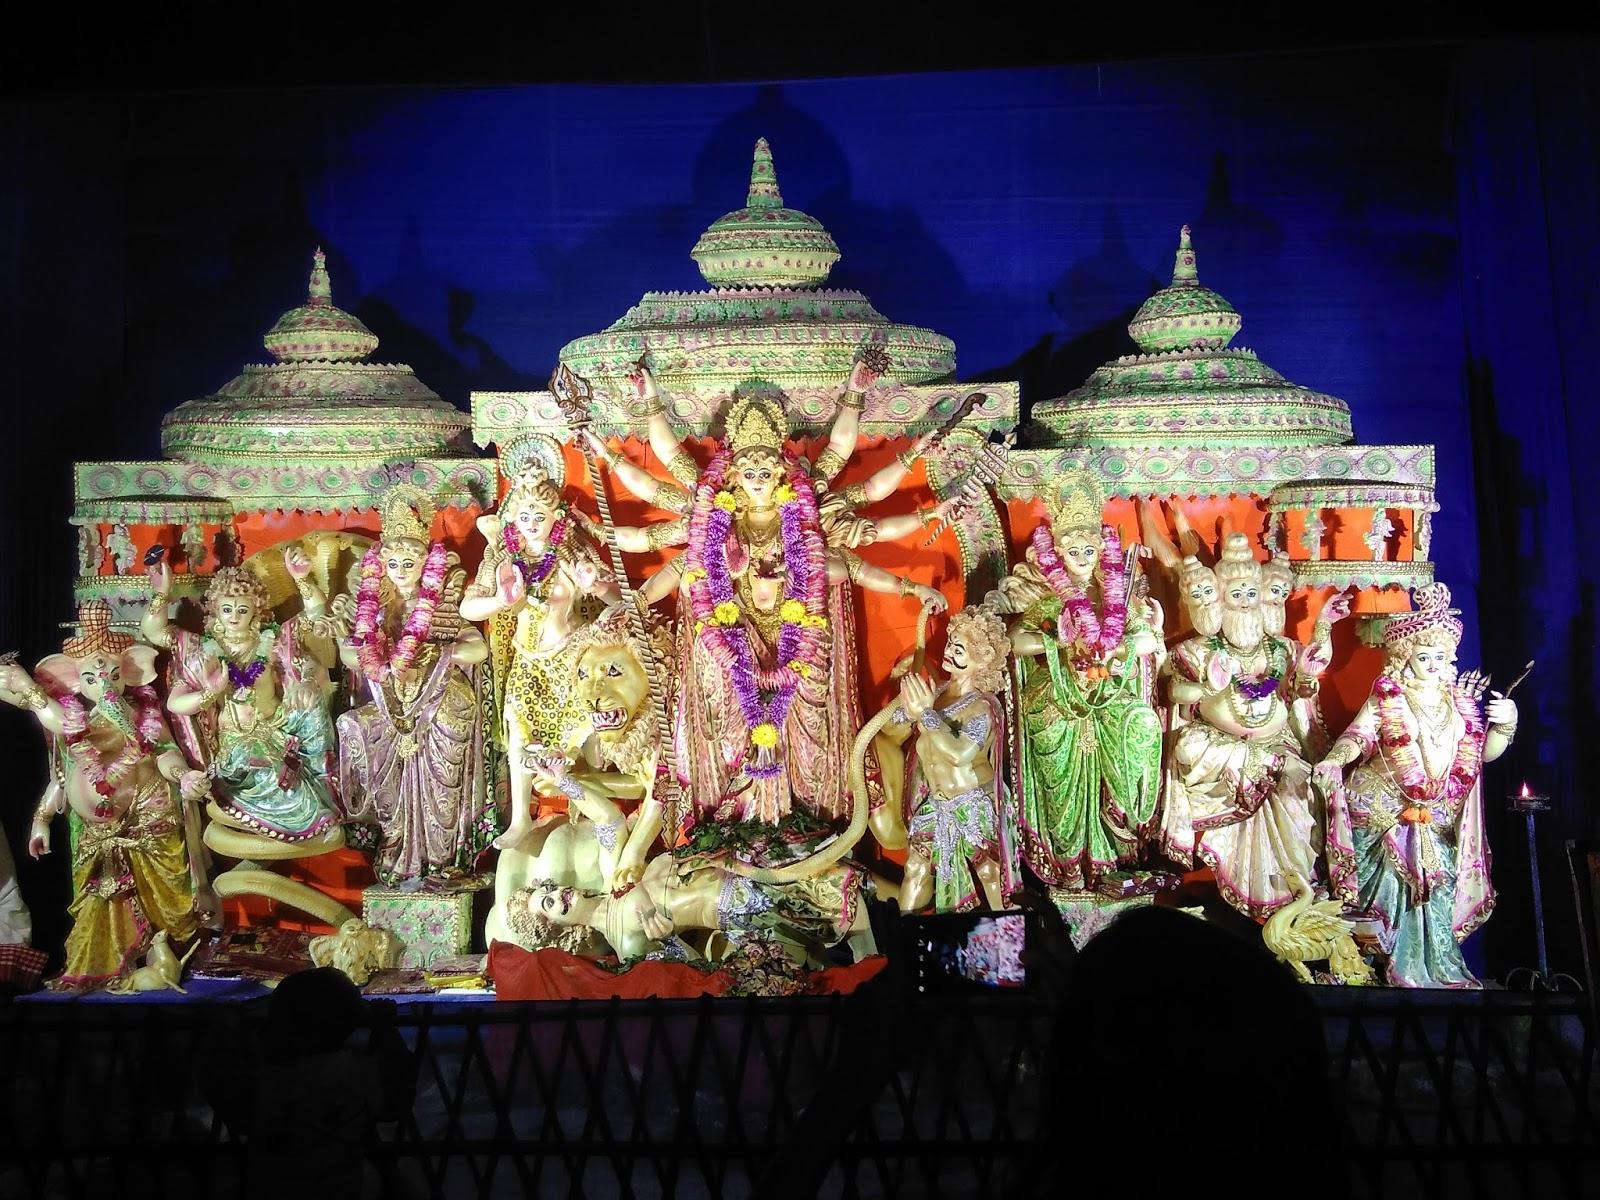 Alipurduar Durga Puja Parikrama 2016 Alipurduar Junction ficial